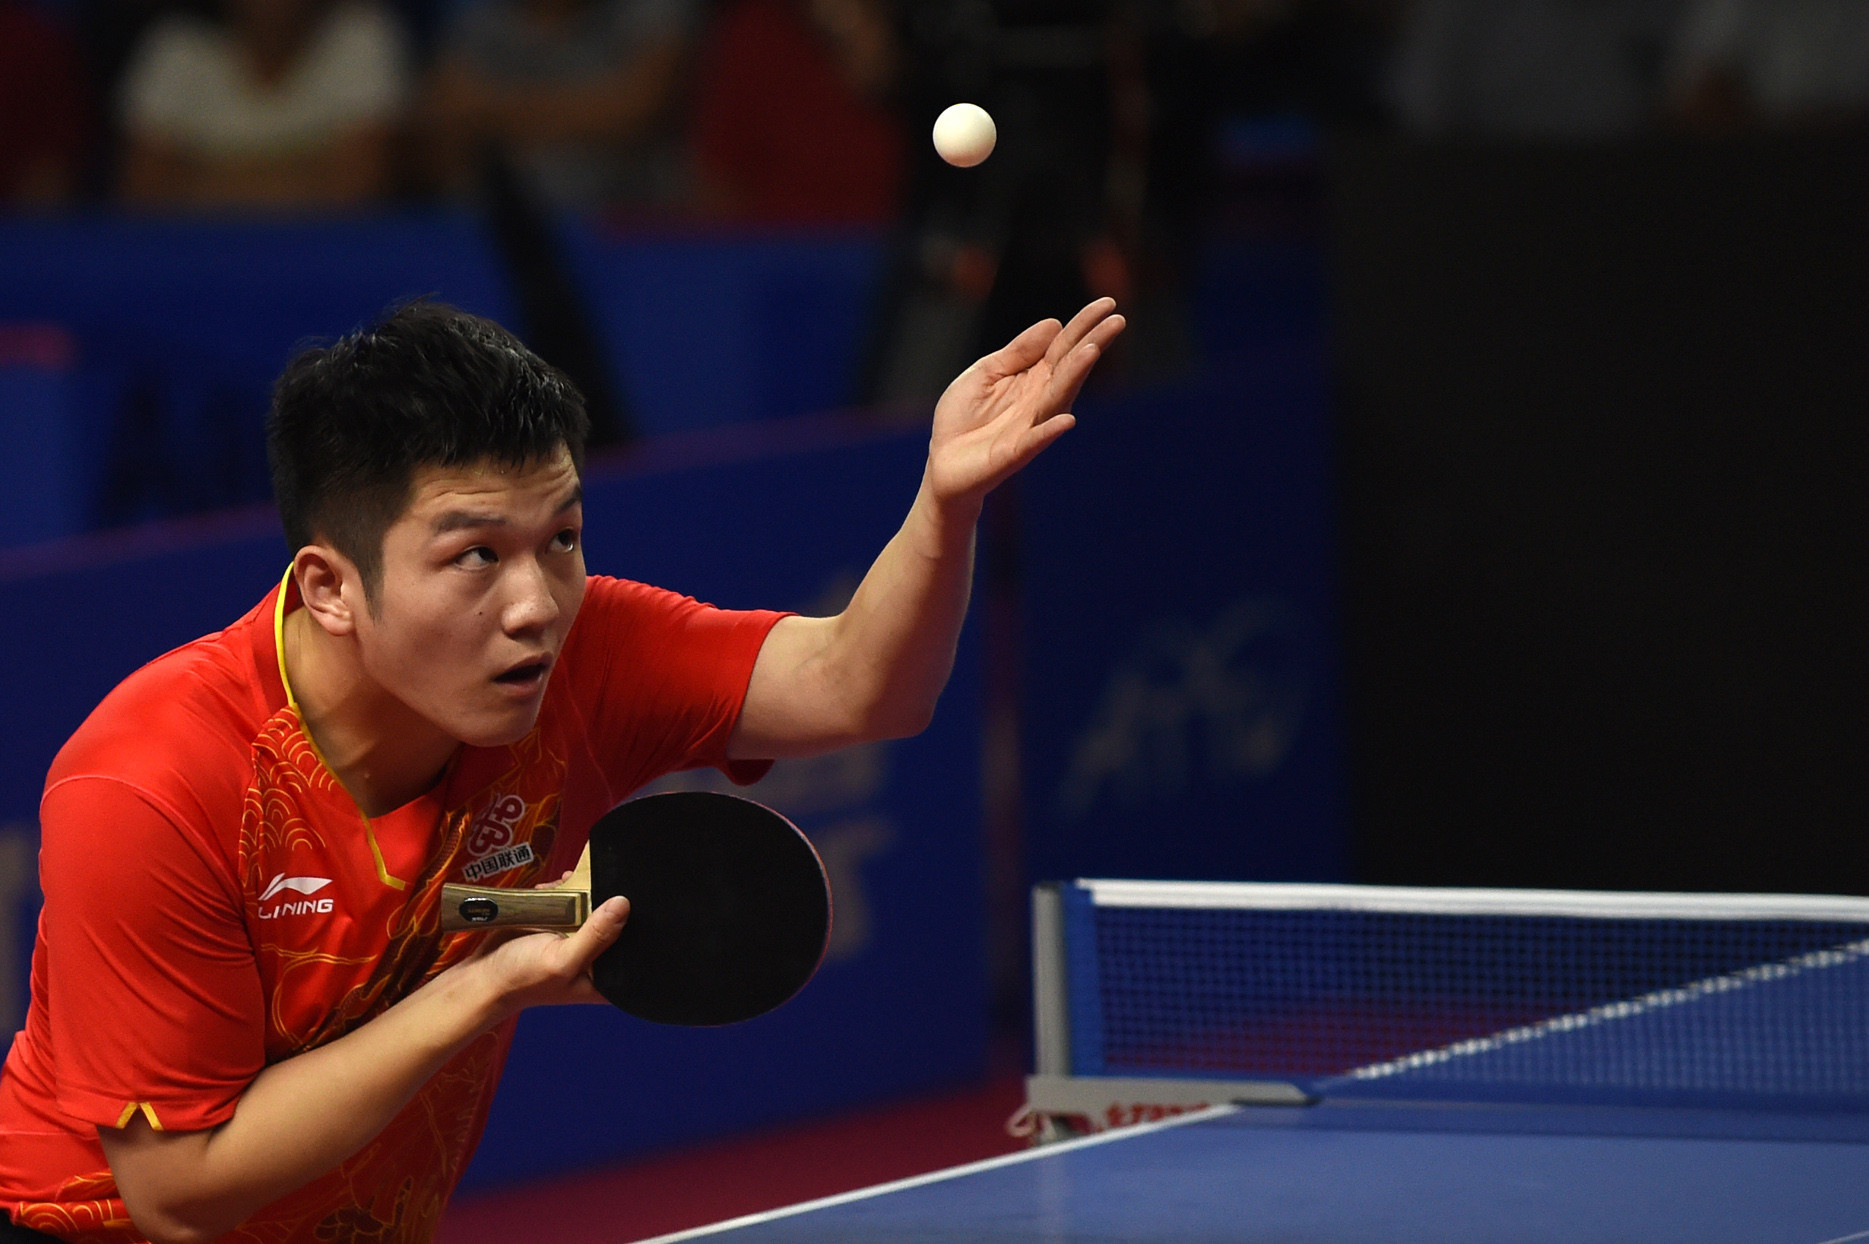 Fan Zhendong Tops Ittf Men S World Rankings For First Time